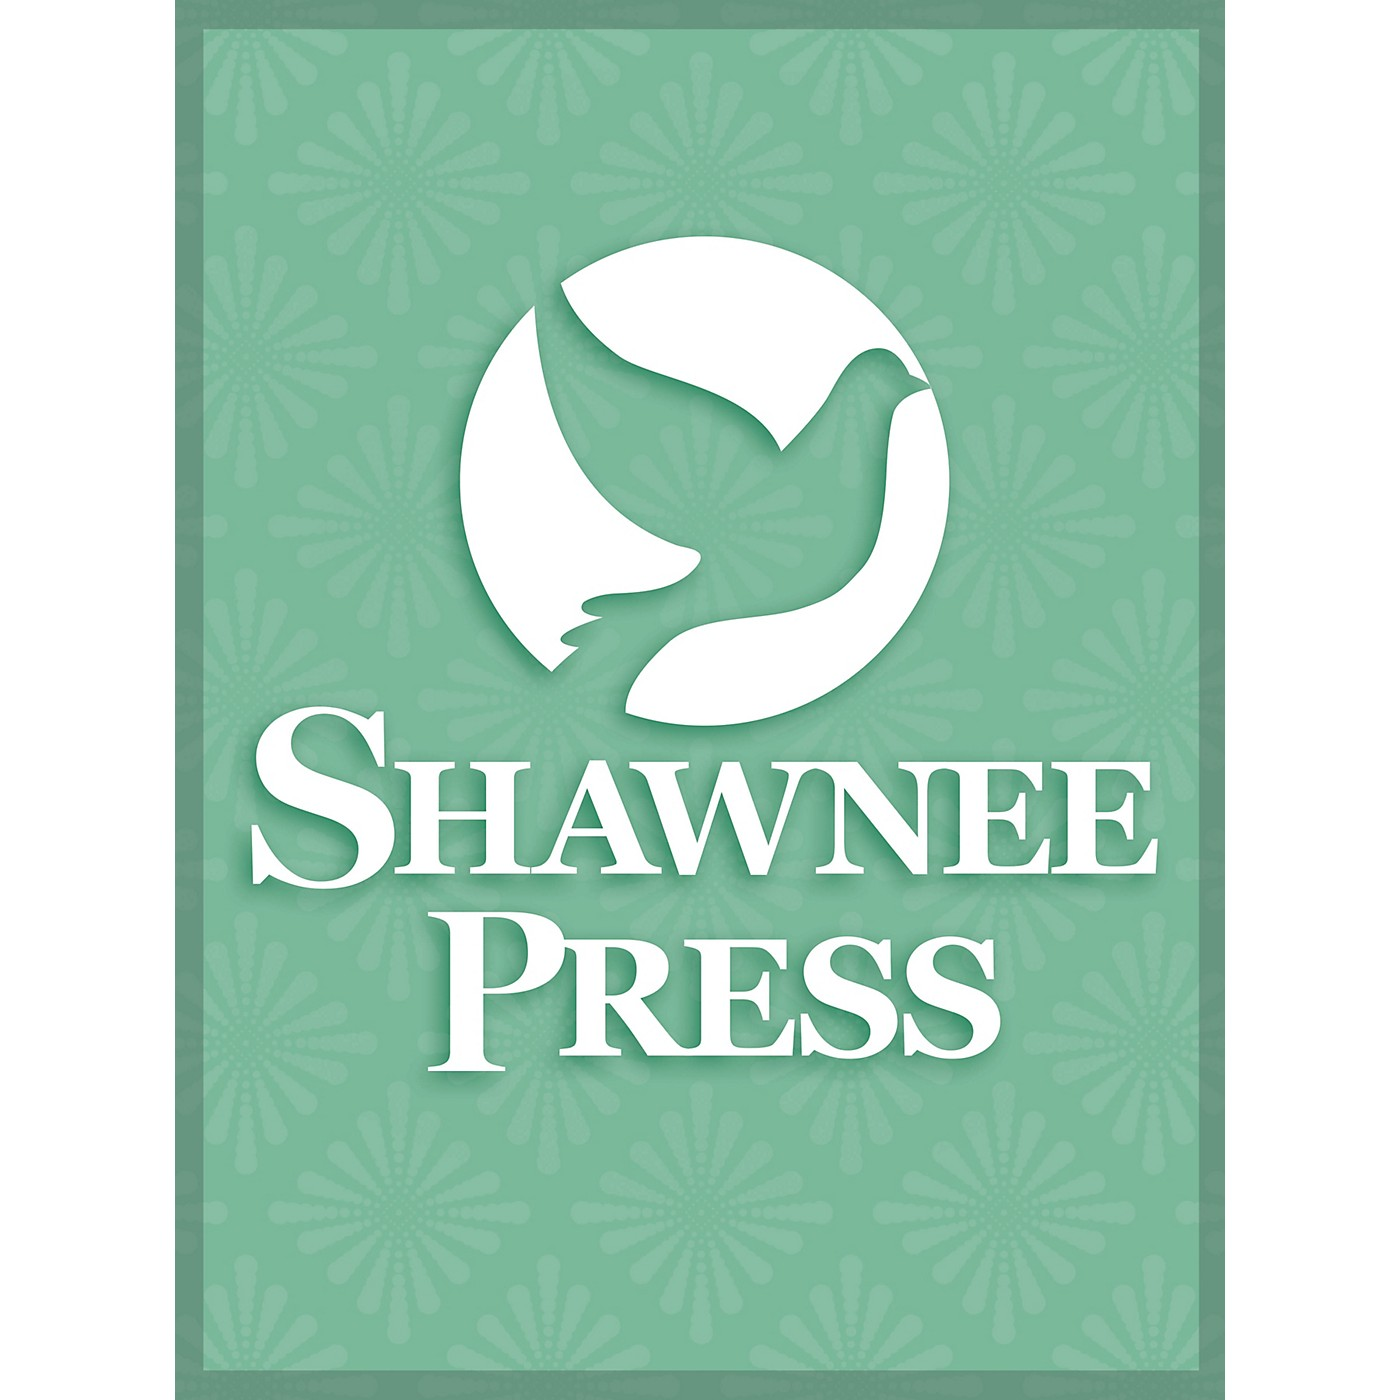 Shawnee Press Bridal Chorus and Wedding March (2-5 Octaves of Handbells) Arranged by Fred Merrett thumbnail